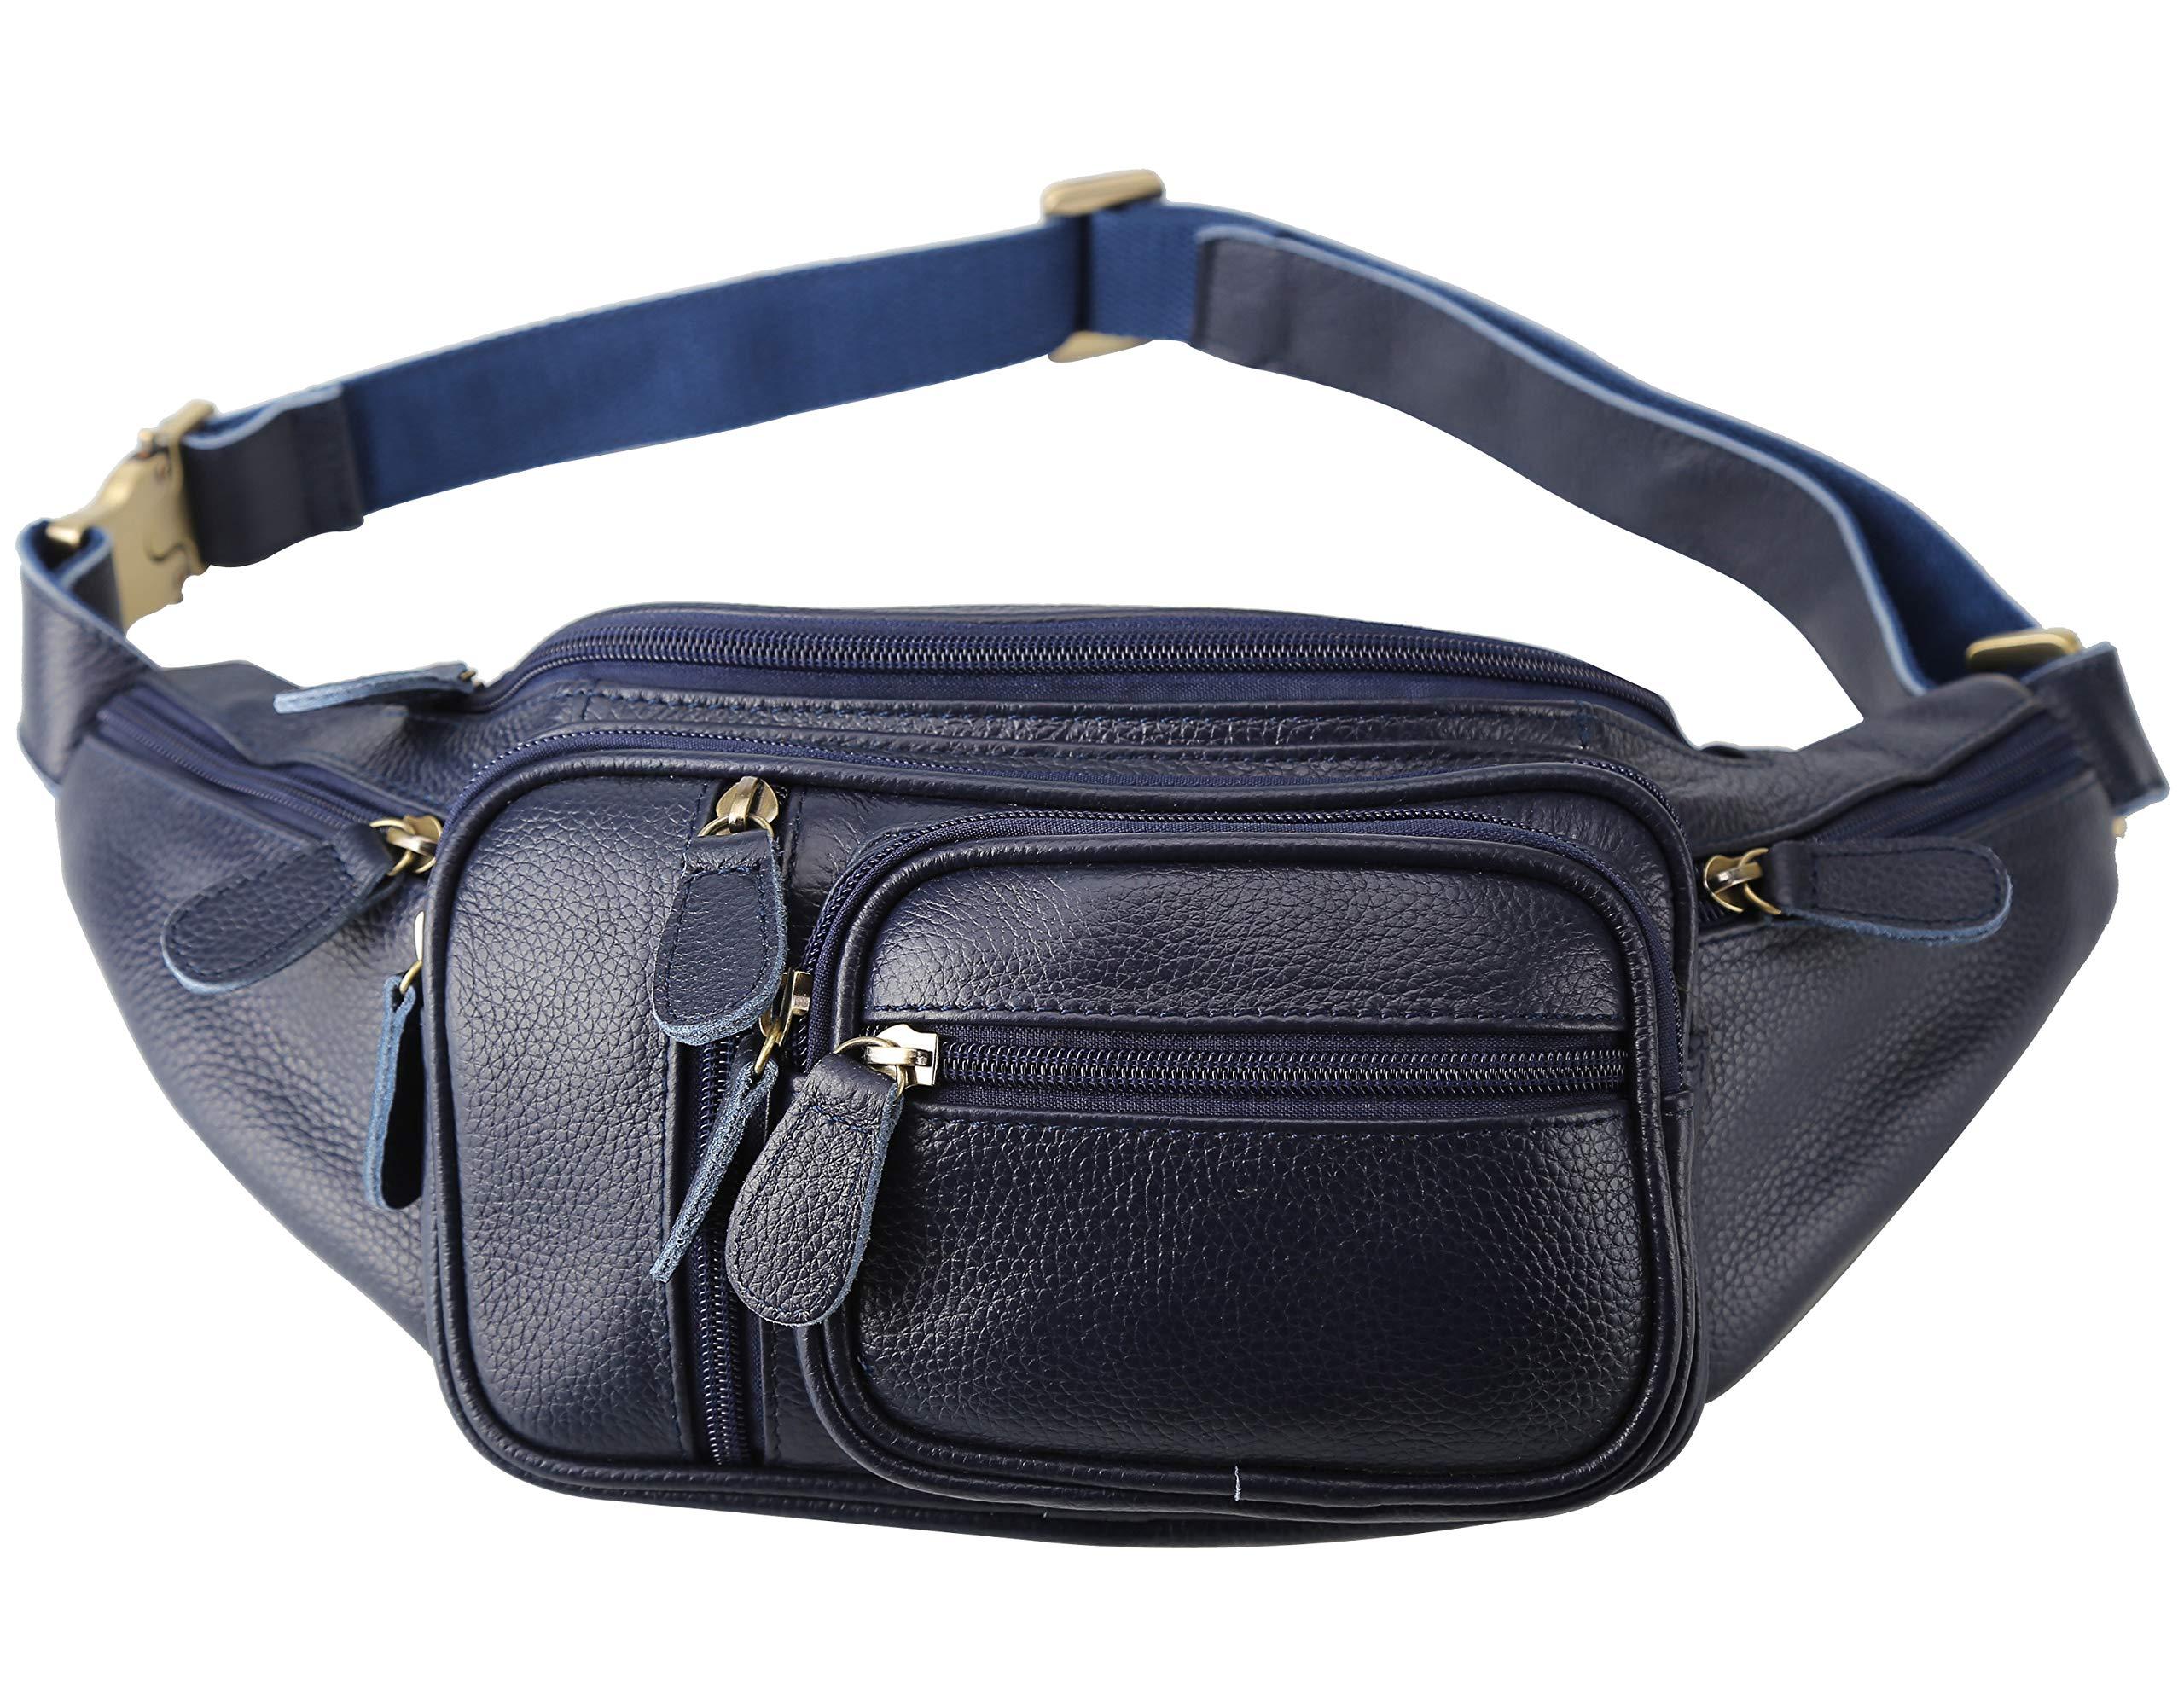 Polare Men's Natural Leather Fanny Pack Waist Bag Black Large (Blue)